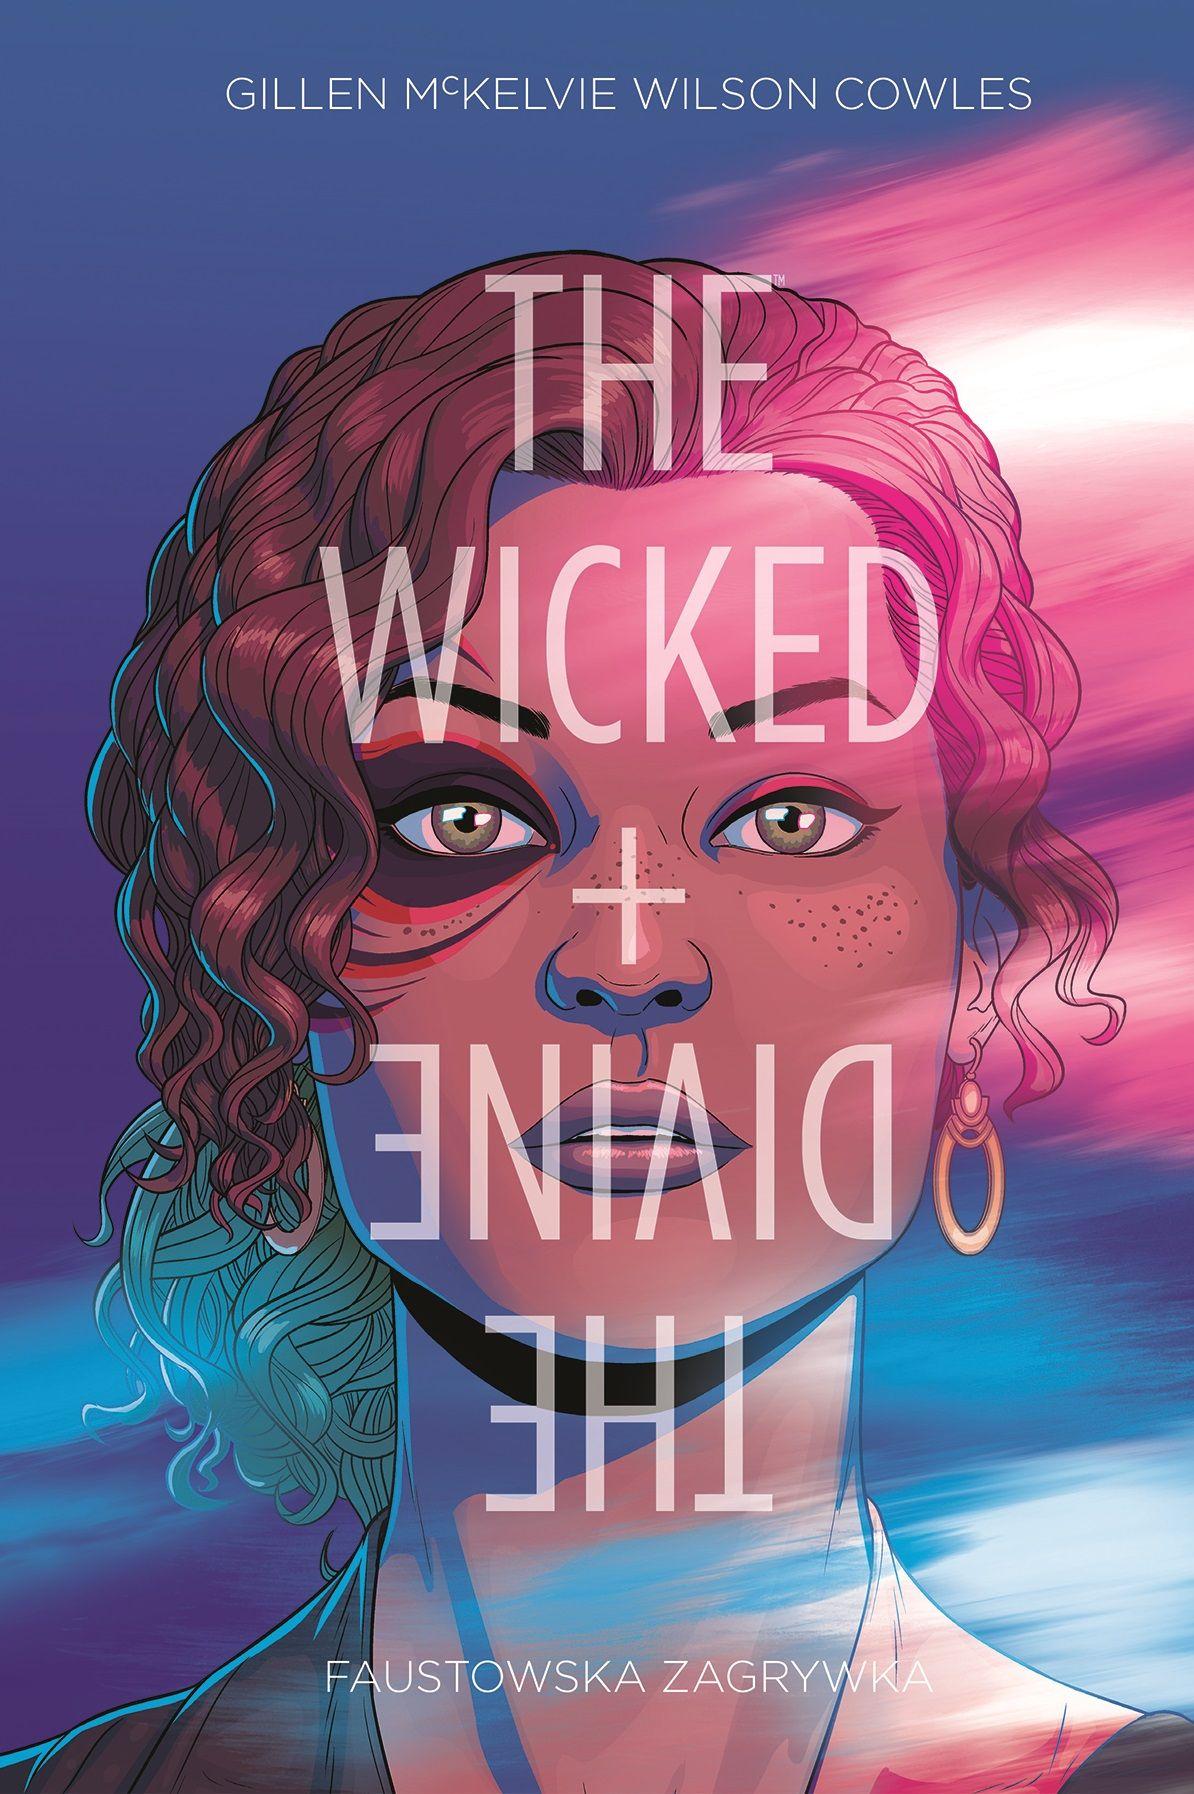 The Wicked + The Divine: Faustowska zagrywka – Recenzja